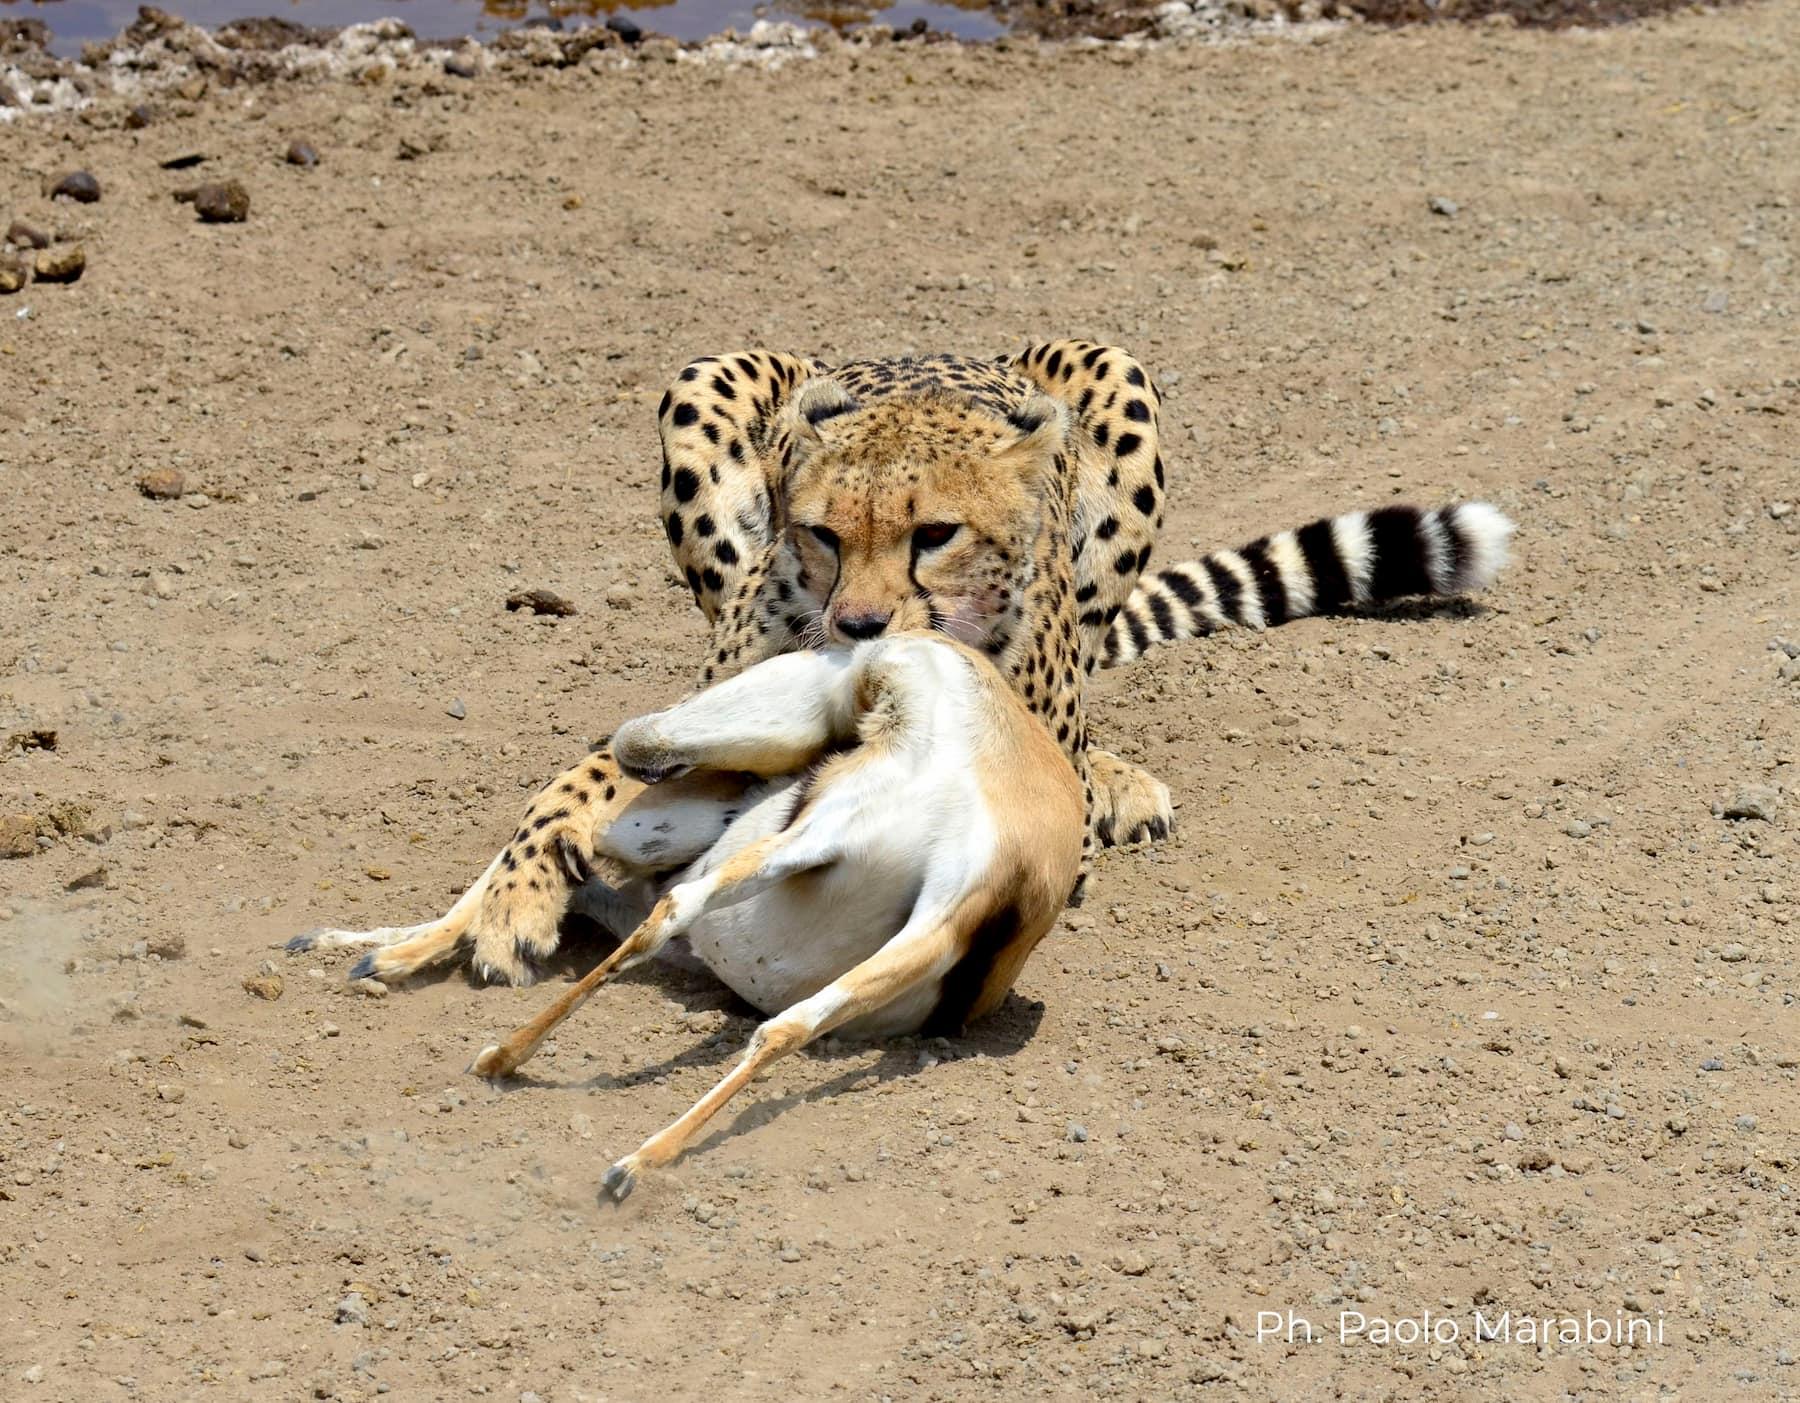 Africa - safari - caccia - ghepardo con gazzella